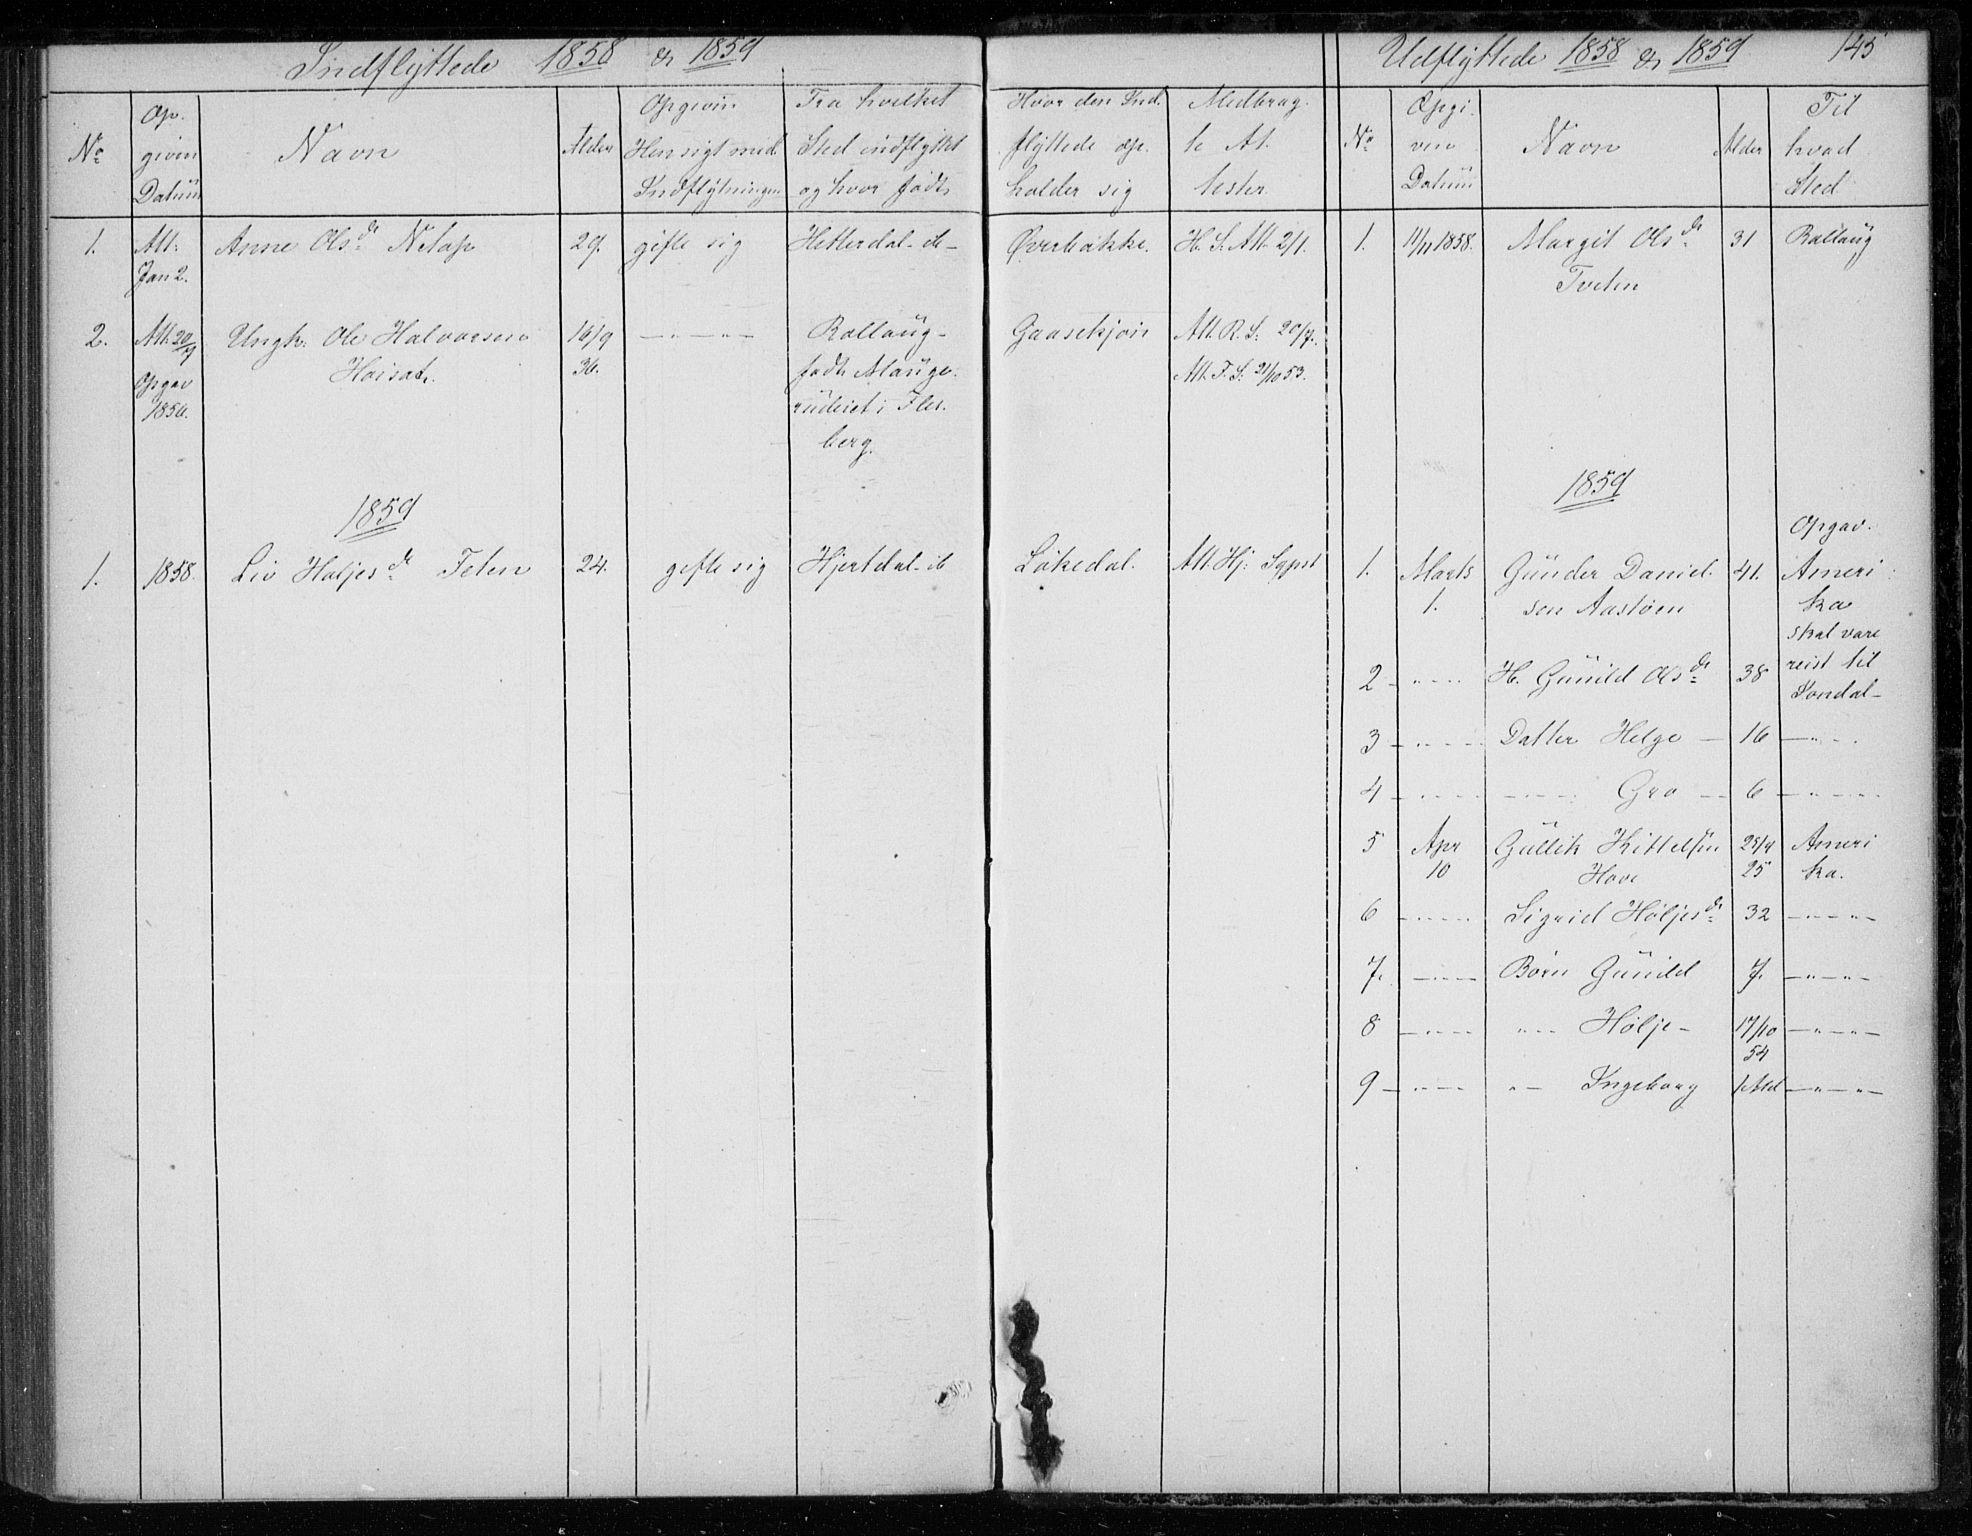 SAKO, Gransherad kirkebøker, F/Fb/L0003: Ministerialbok nr. II 3, 1844-1859, s. 145